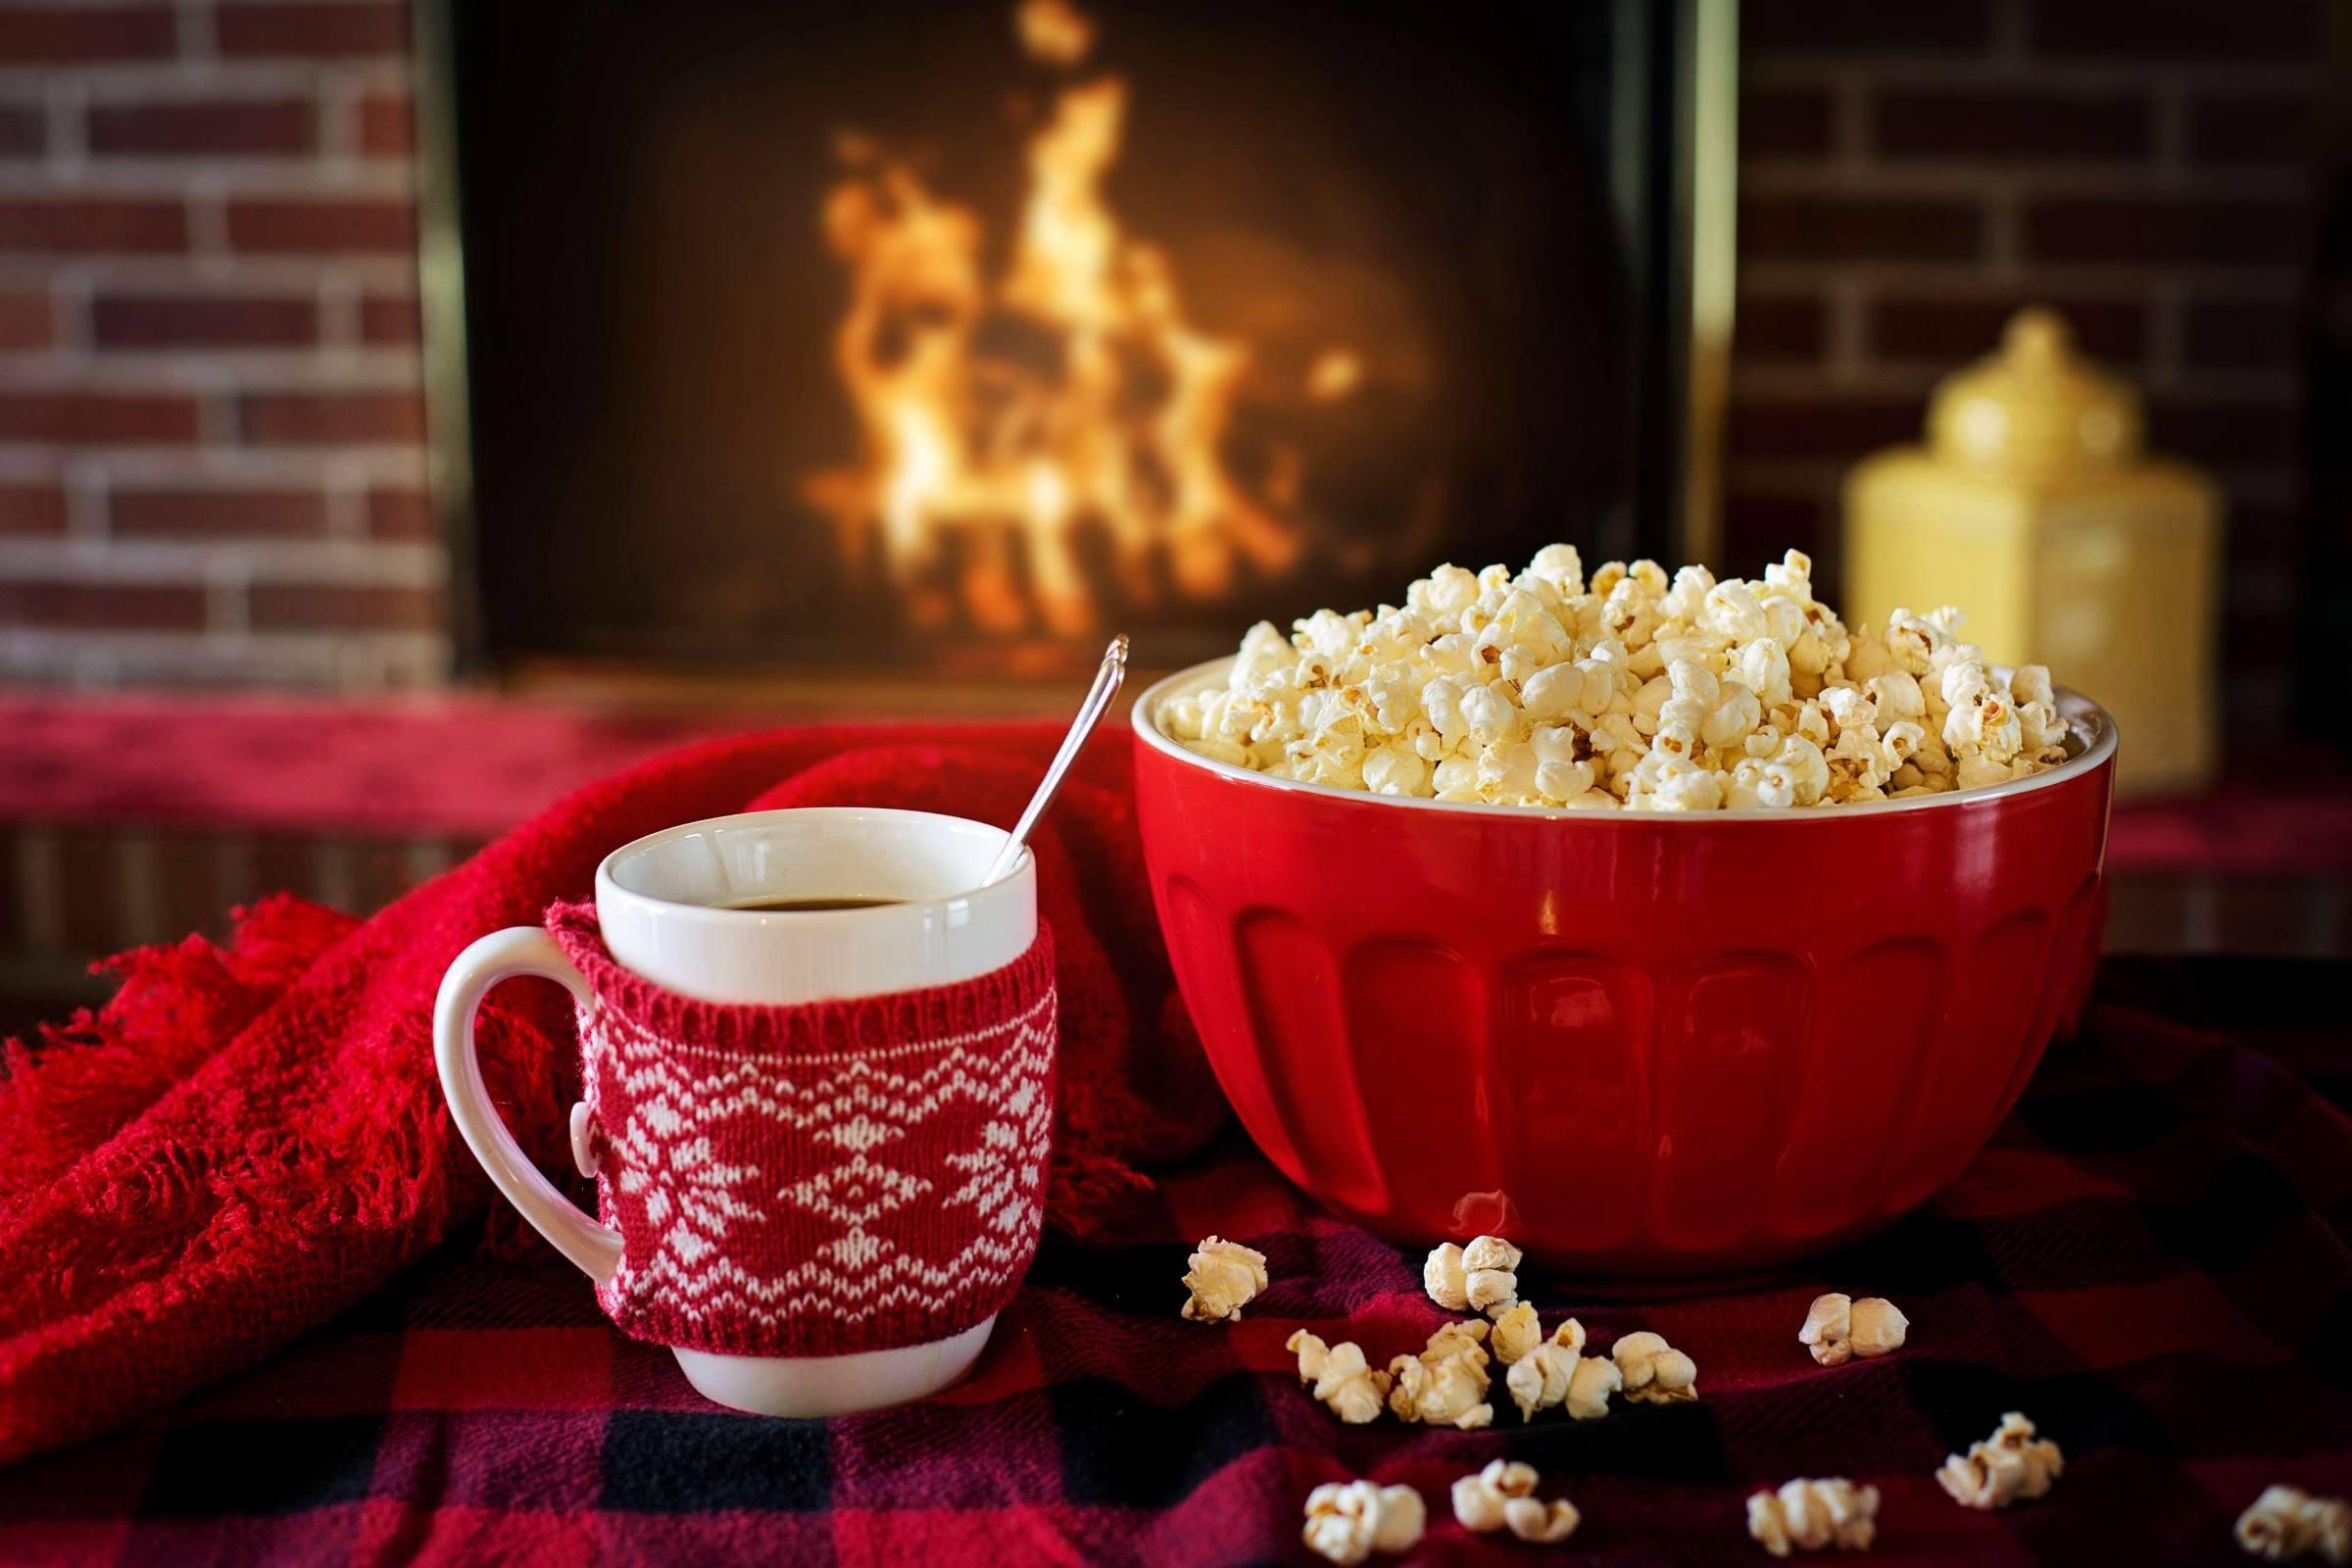 Mug of coffee and popcorn